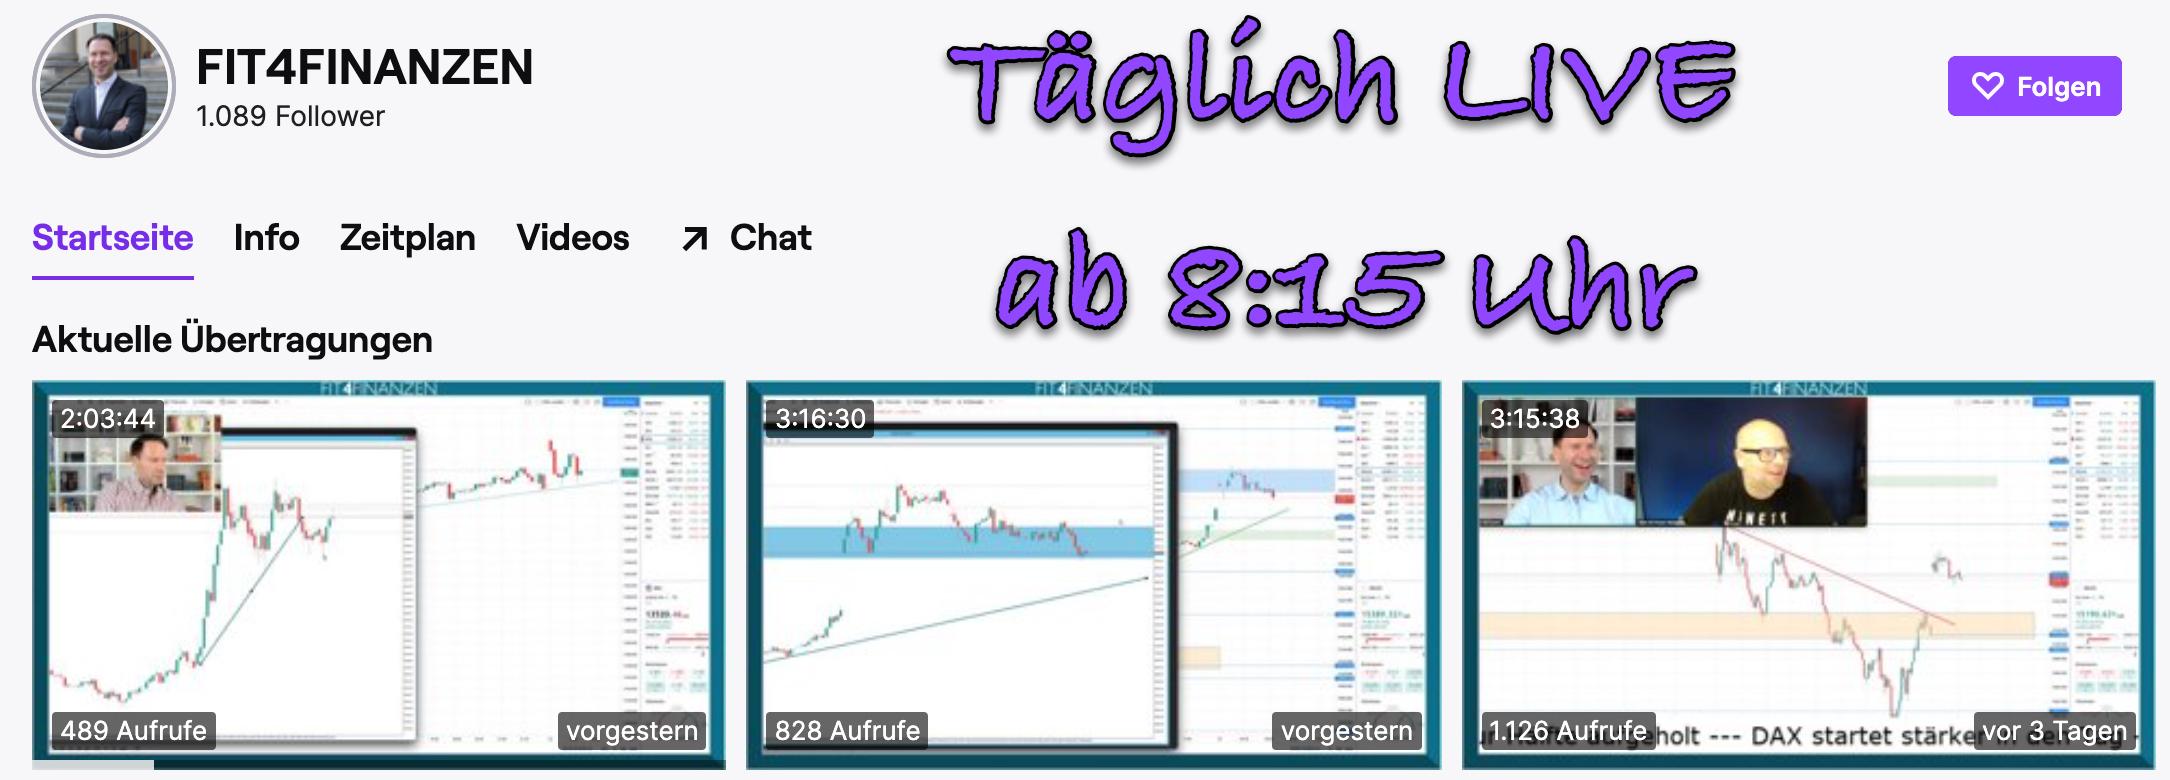 Twitch-Kanal FIT4FINANZEN